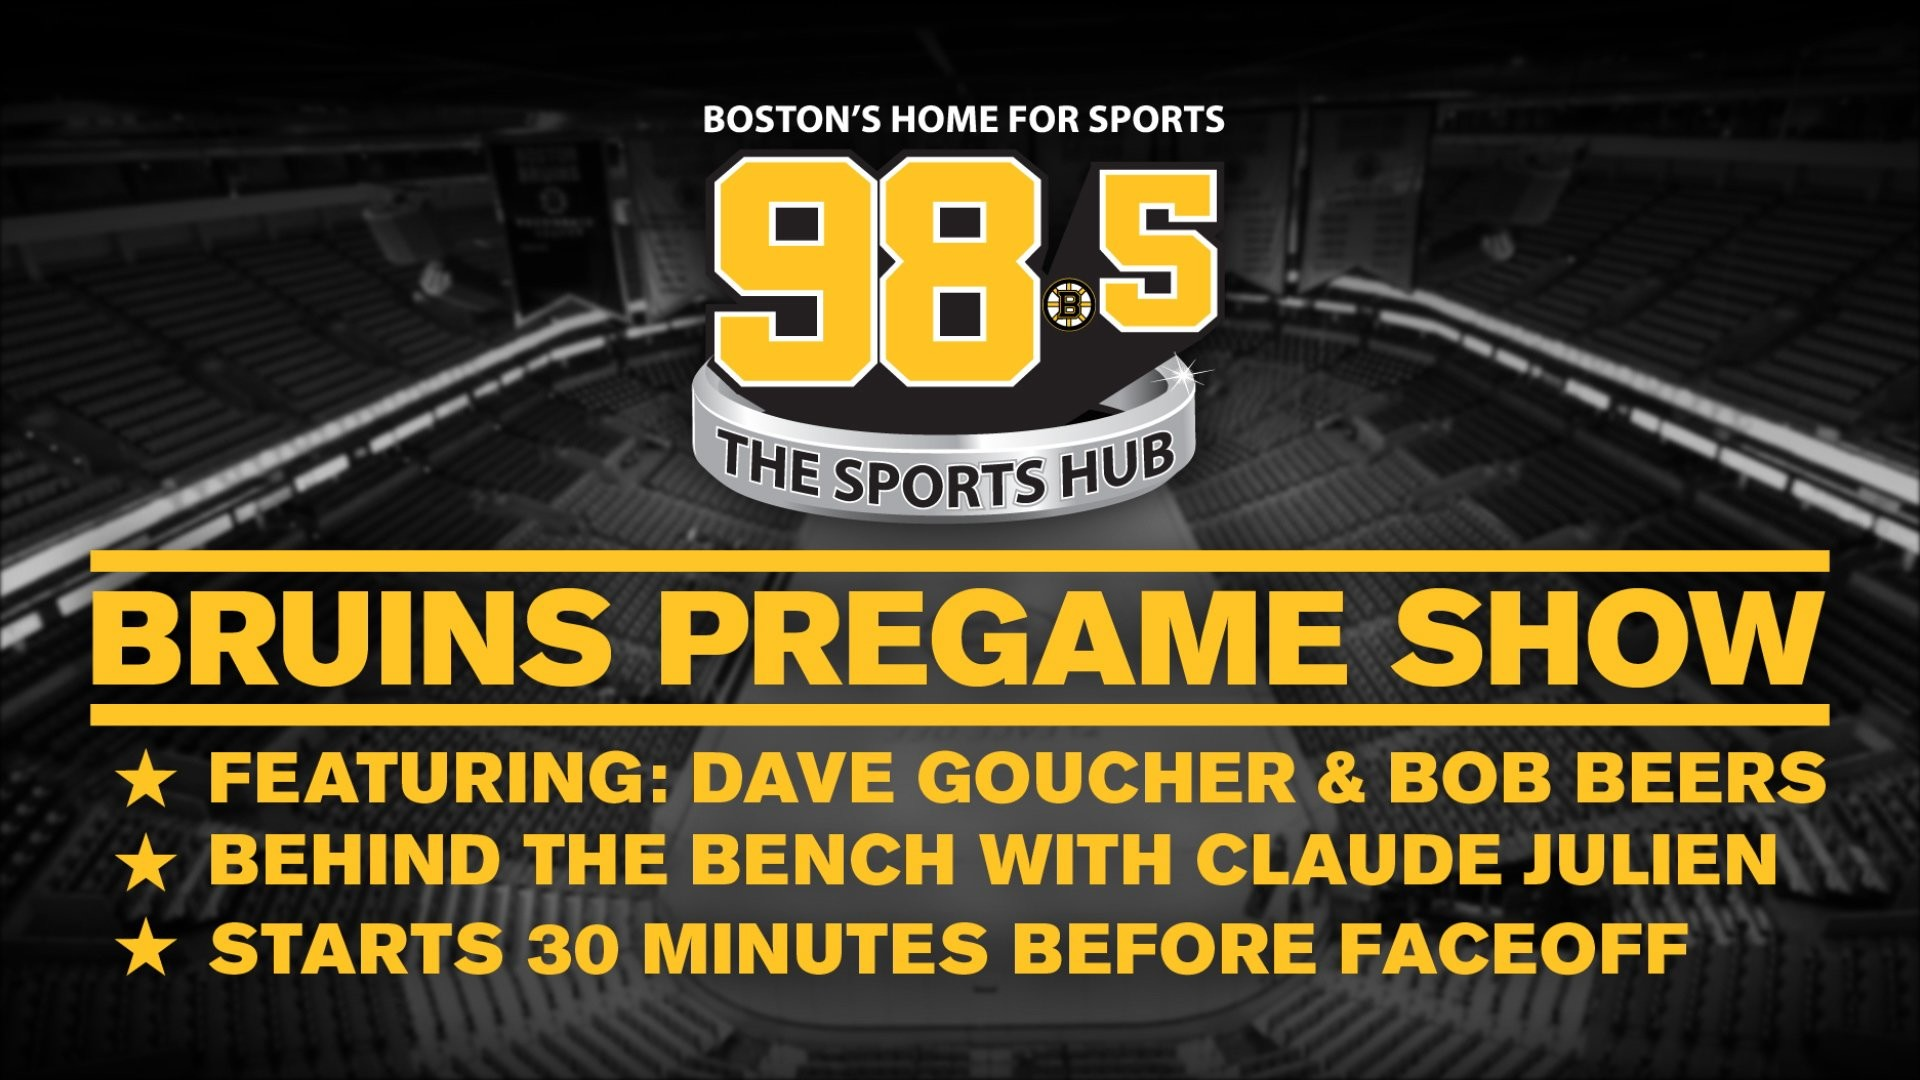 Football Brazilian Player Locker Silva Neymar Boston Bruins Pregame